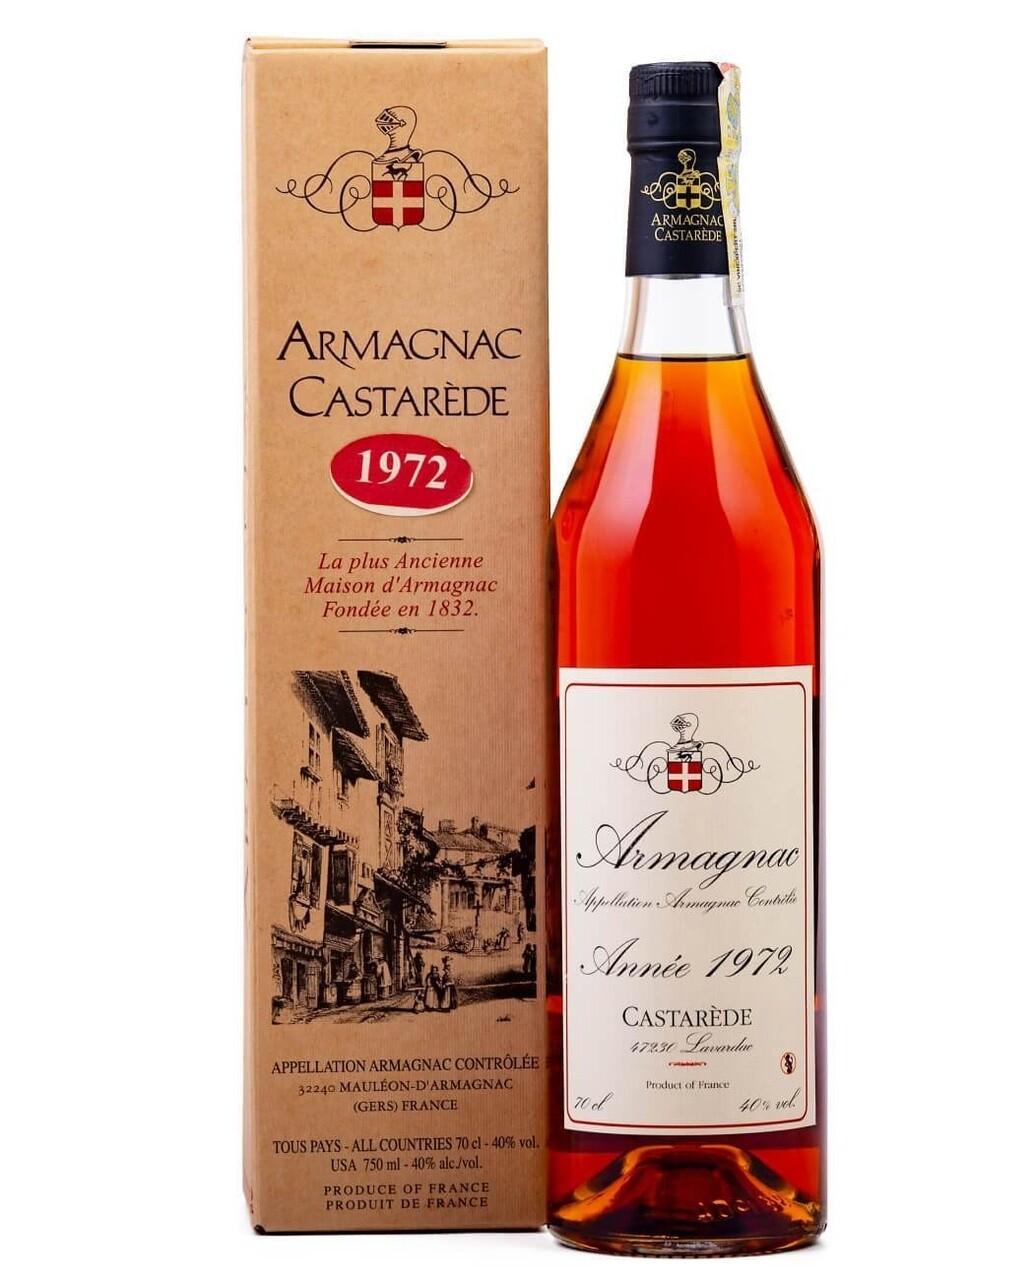 Armagnac Castarede 1972 0.5L